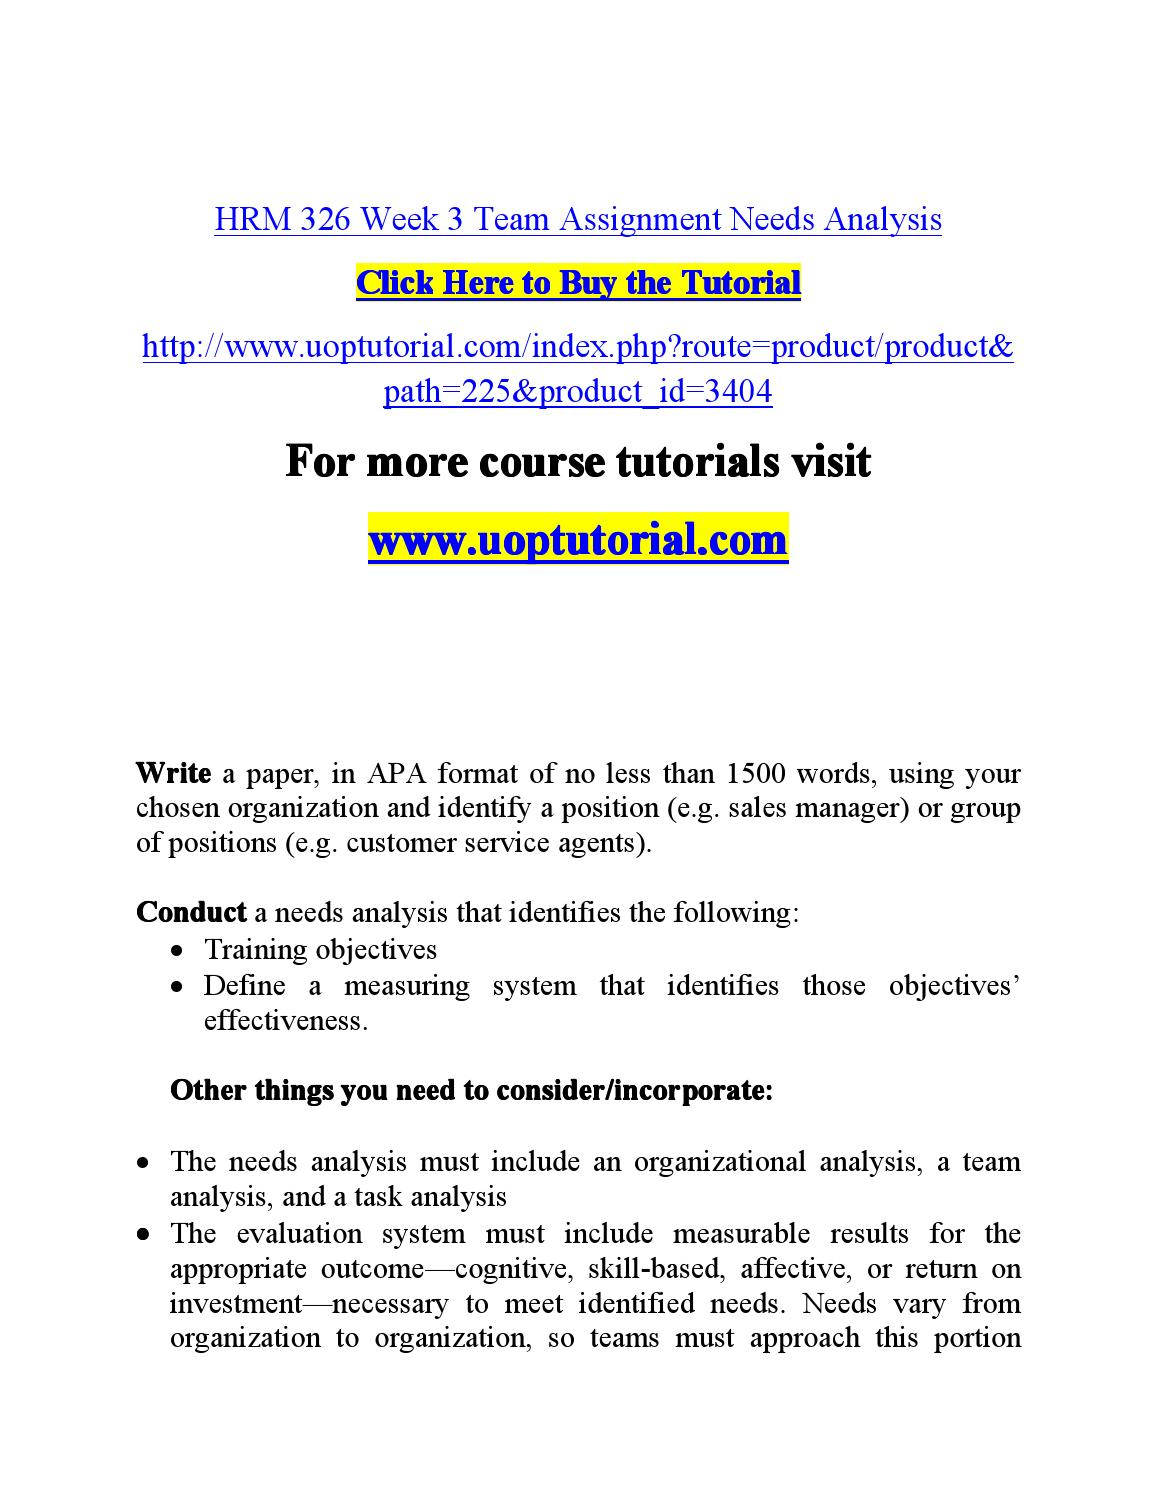 HRM 326 WEEK 5 Professional Development Plan